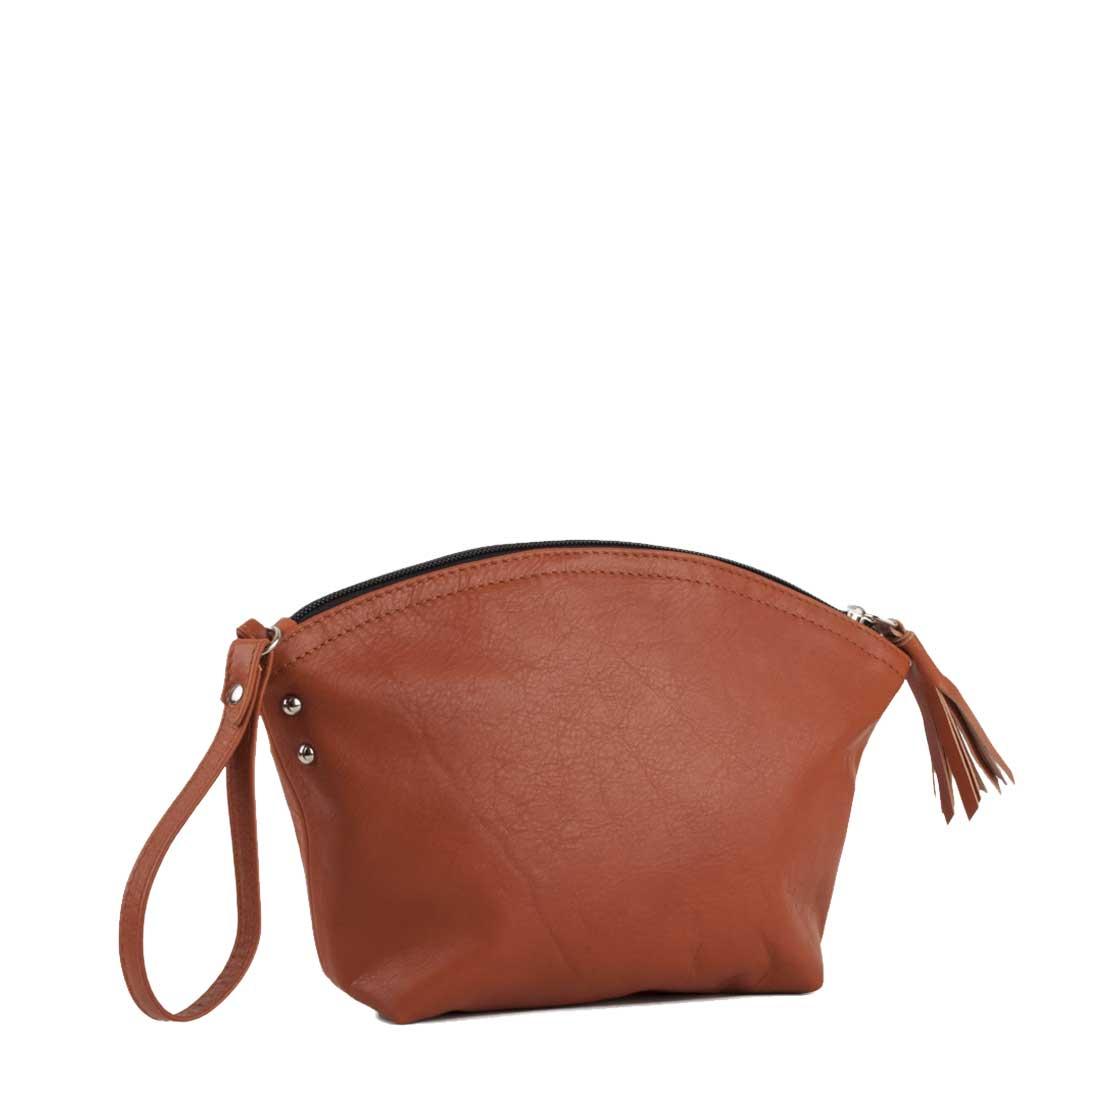 Wrist Bag In Zucca Leather